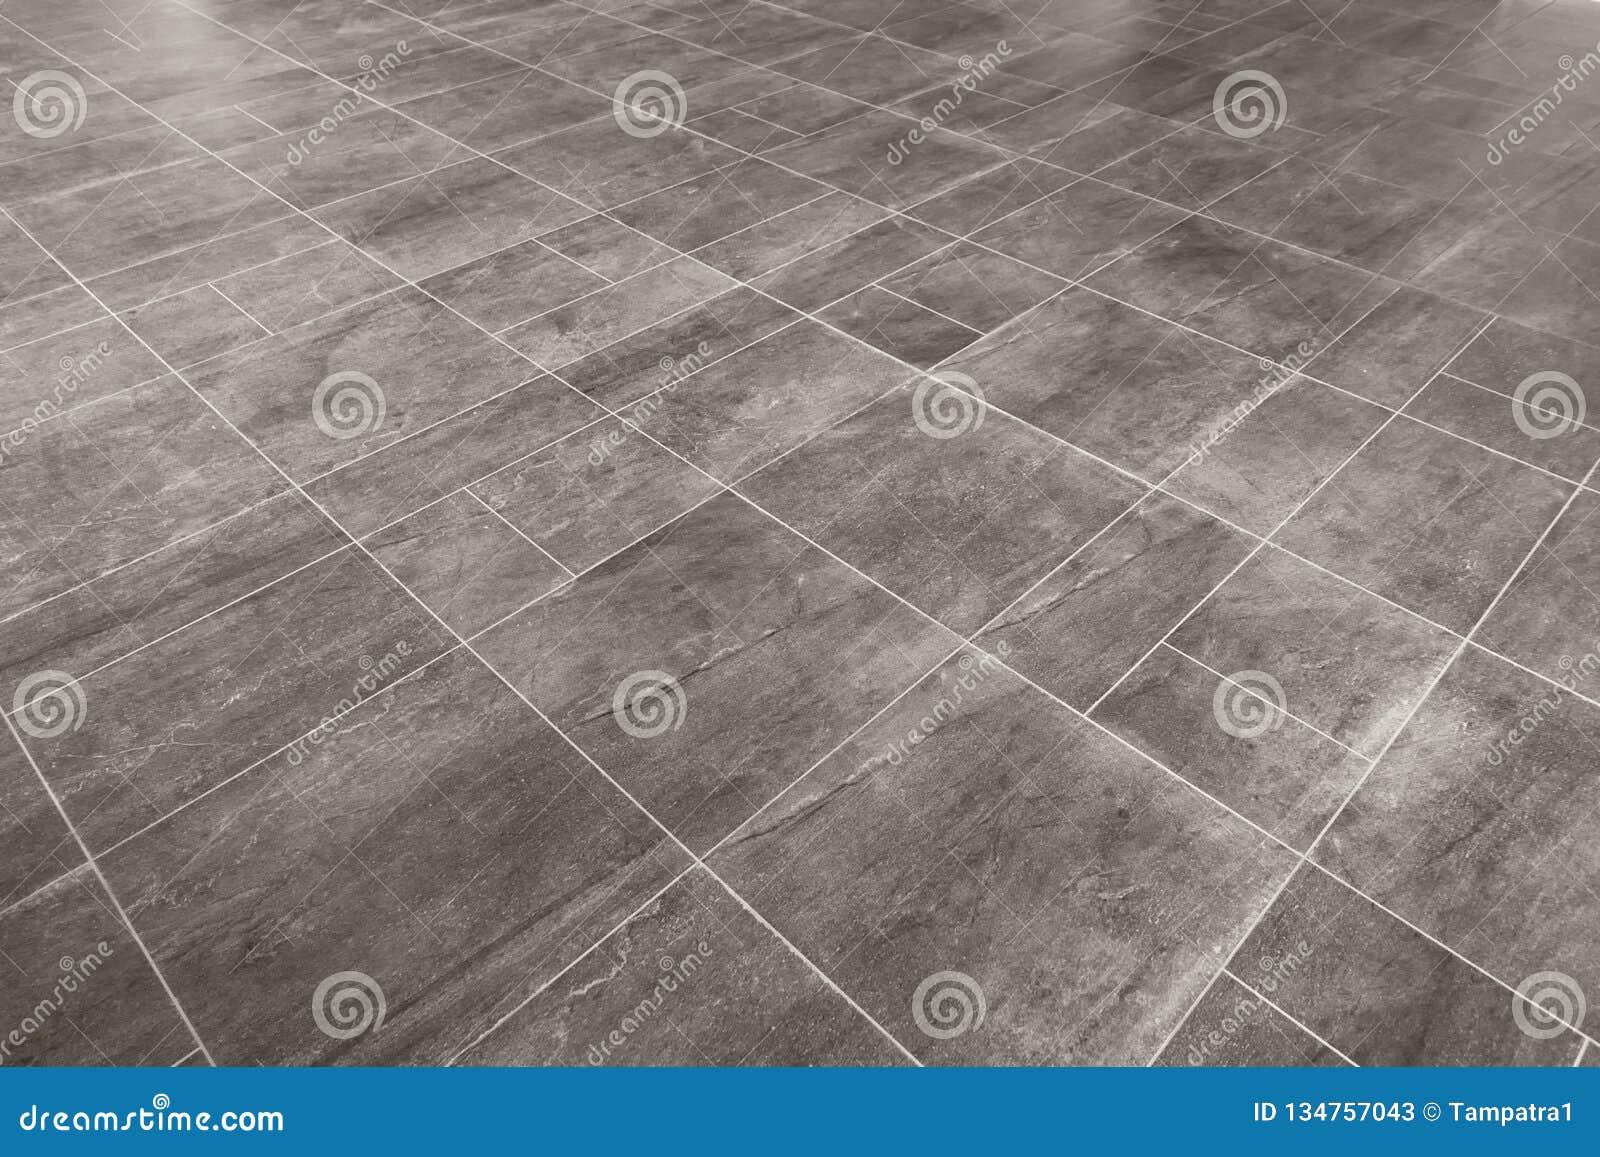 Gray Marble Rectangular Tiles Flooring Pattern Surface Texture Close Up Of Interior Design Decoration Background Stock Image Image Of Interior Block 134757043